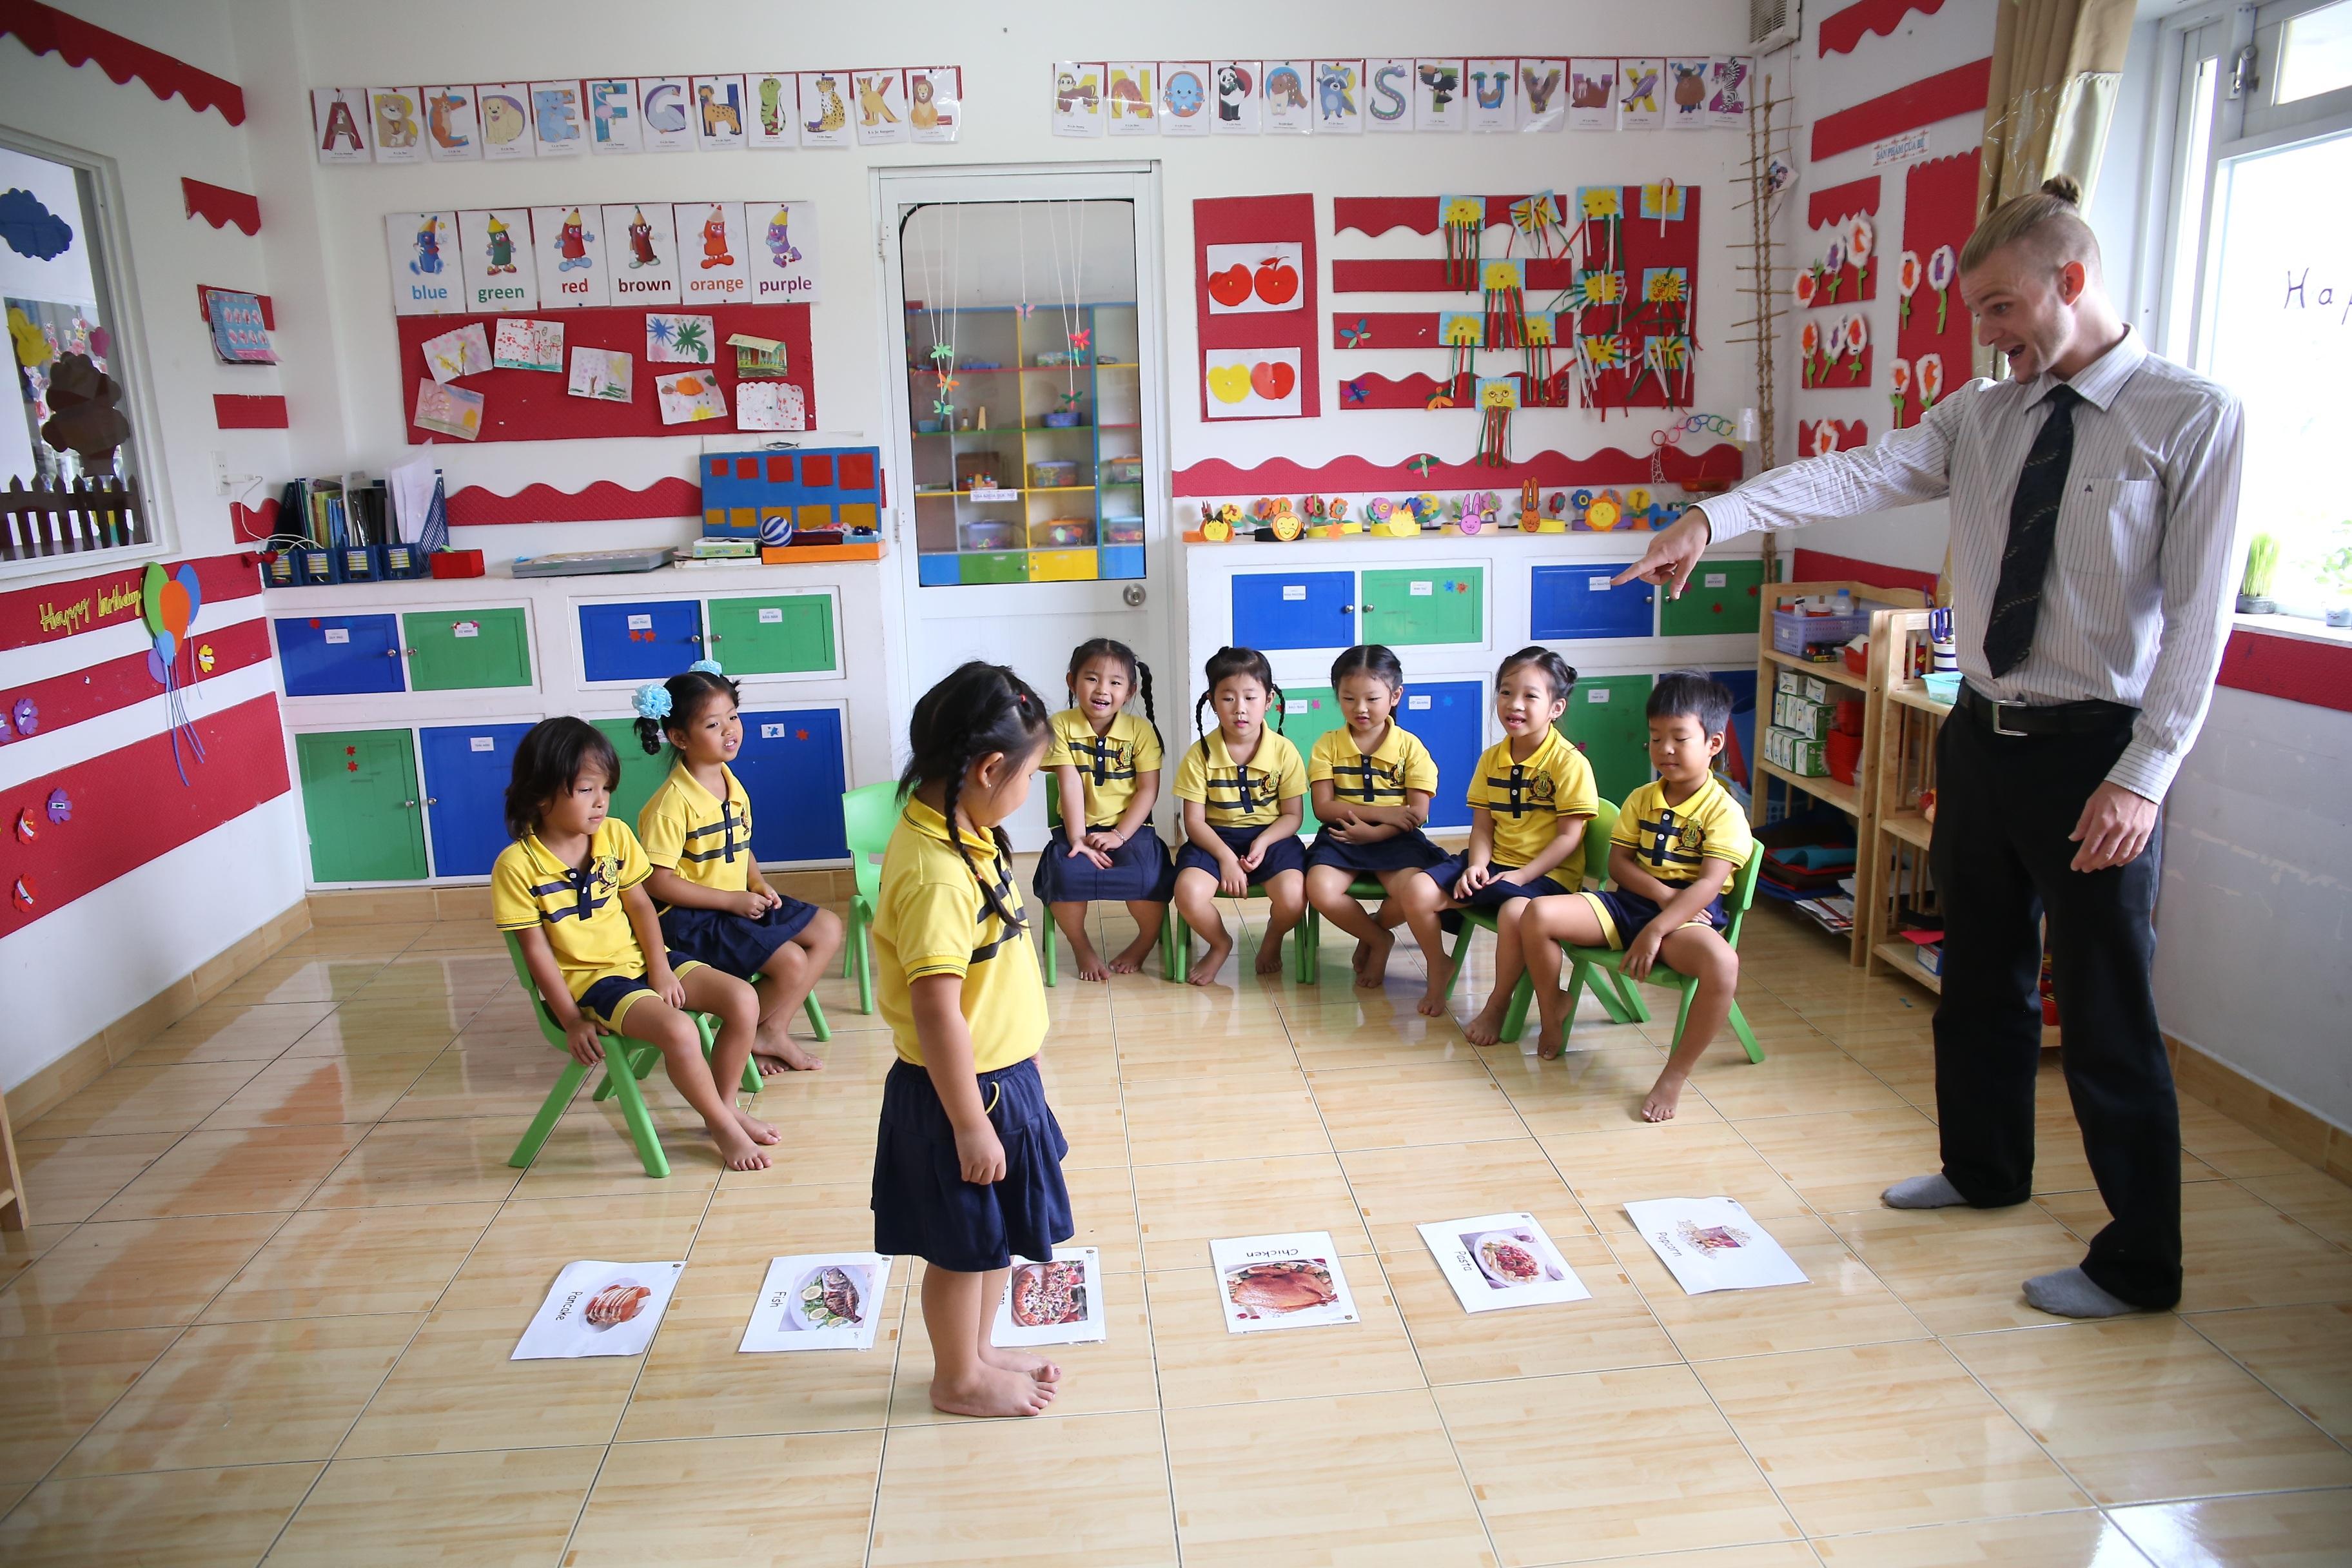 Design Your Classroom Games ~ Free images game classroom kids study kindergarten